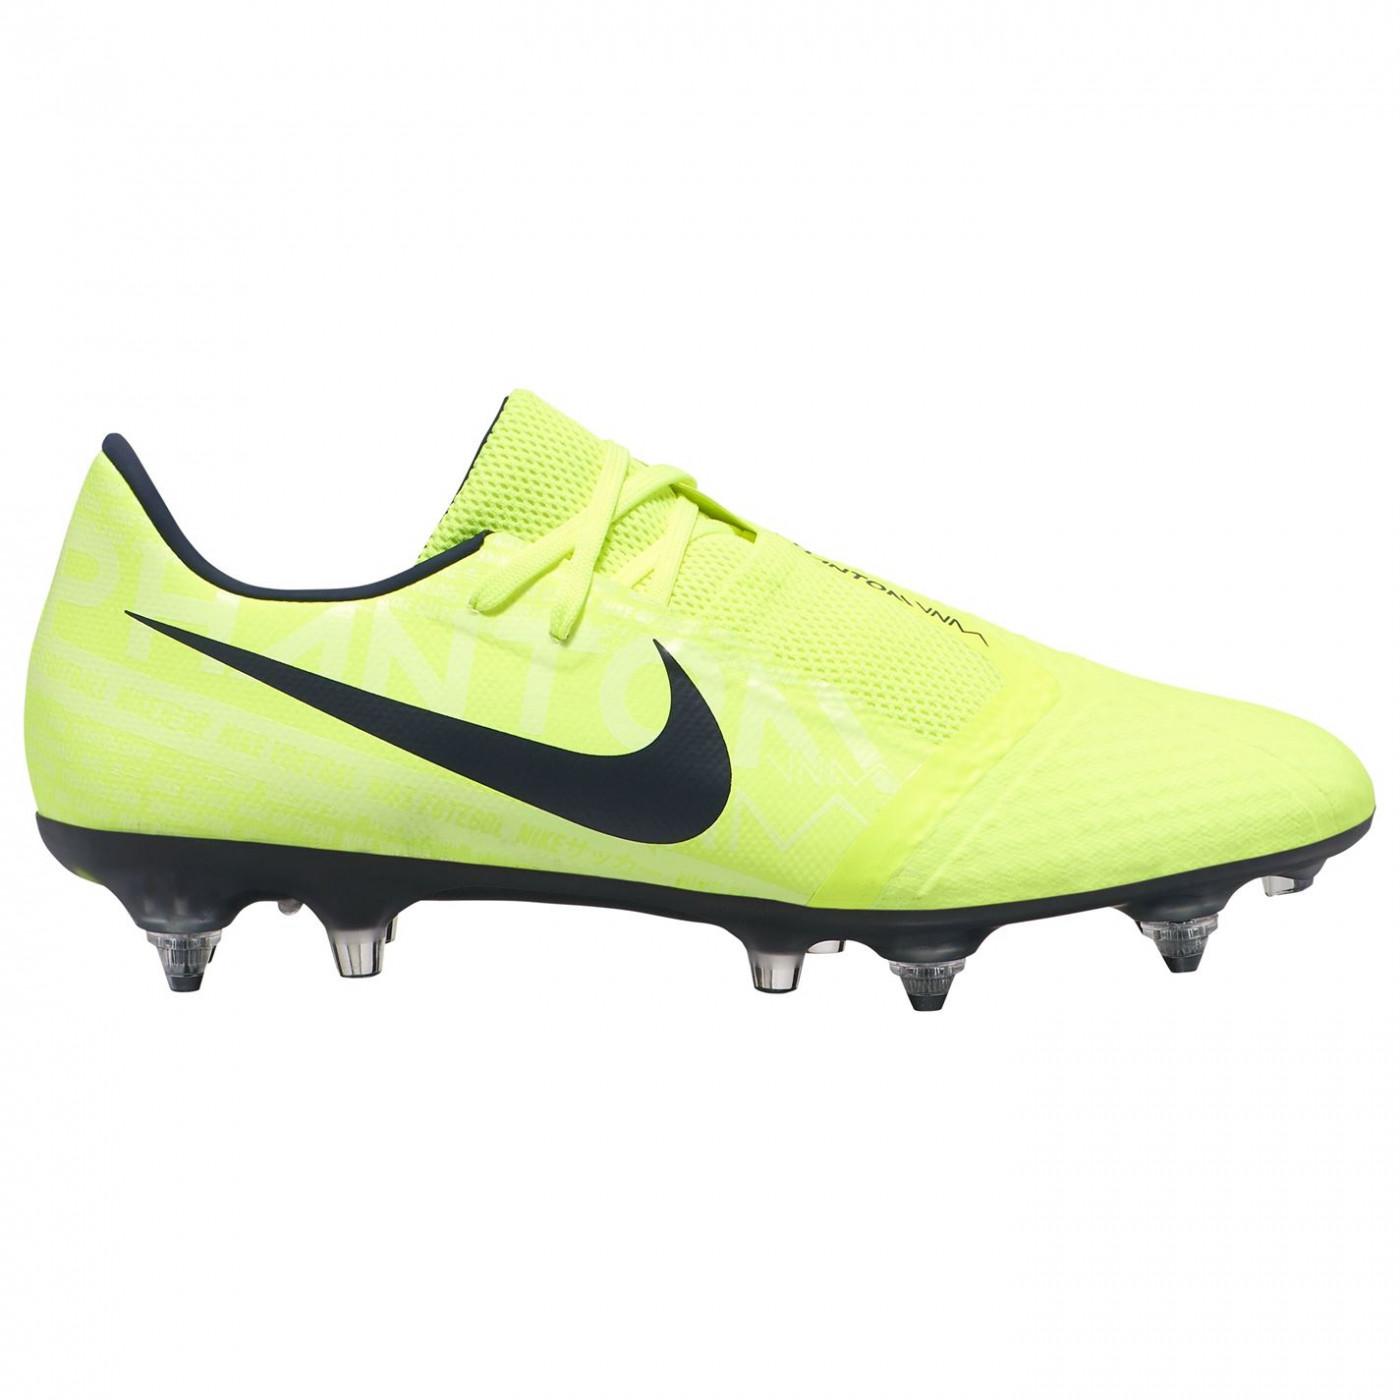 Nike Phantom Venom Academy Mens SG Football Boots